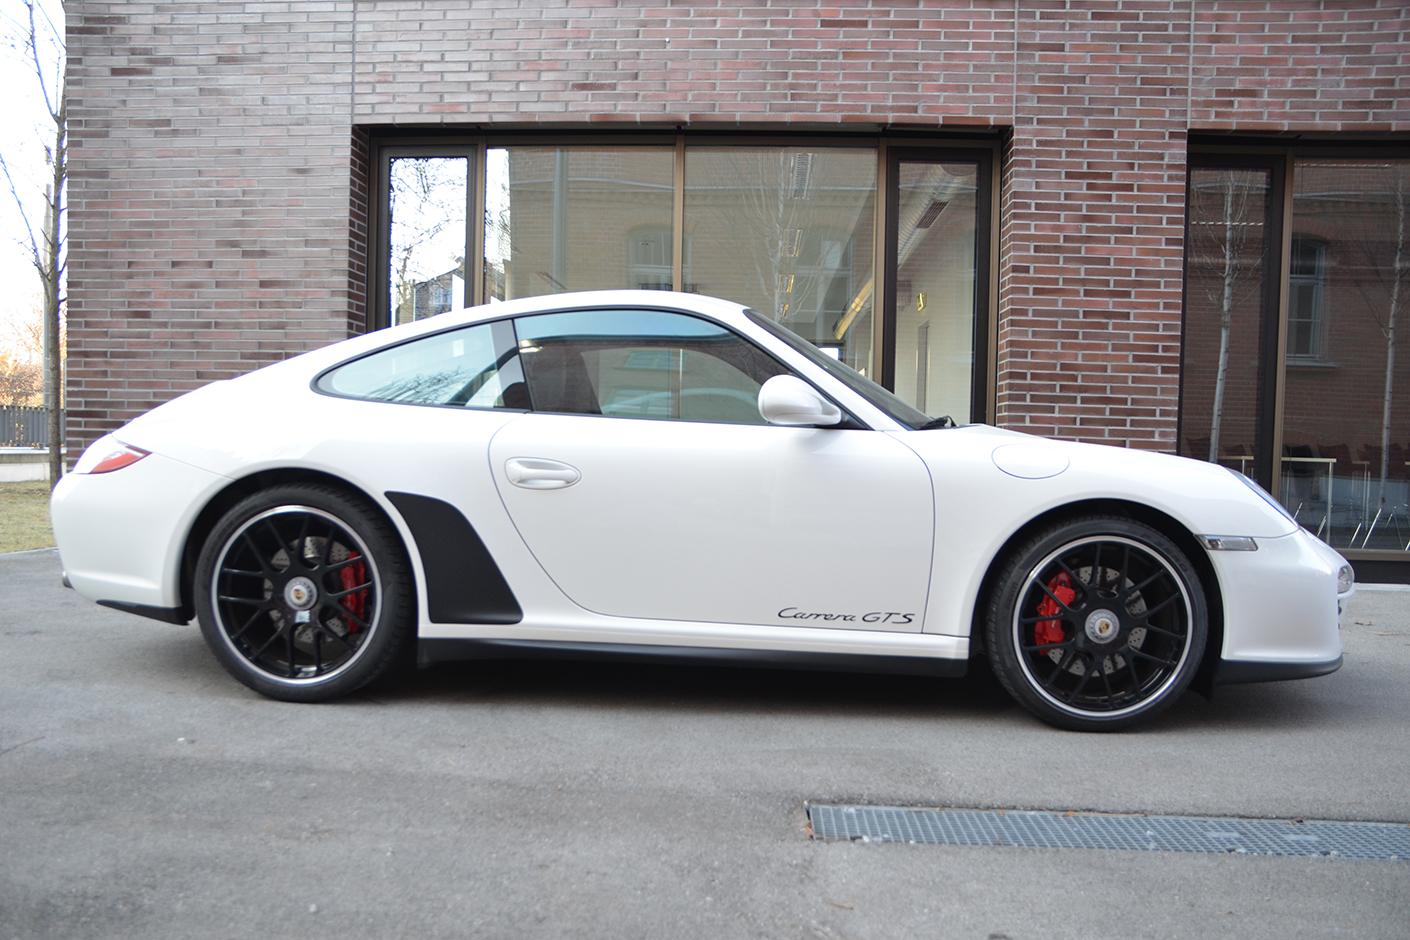 Porsche 997 Carrera GTS 2011-5